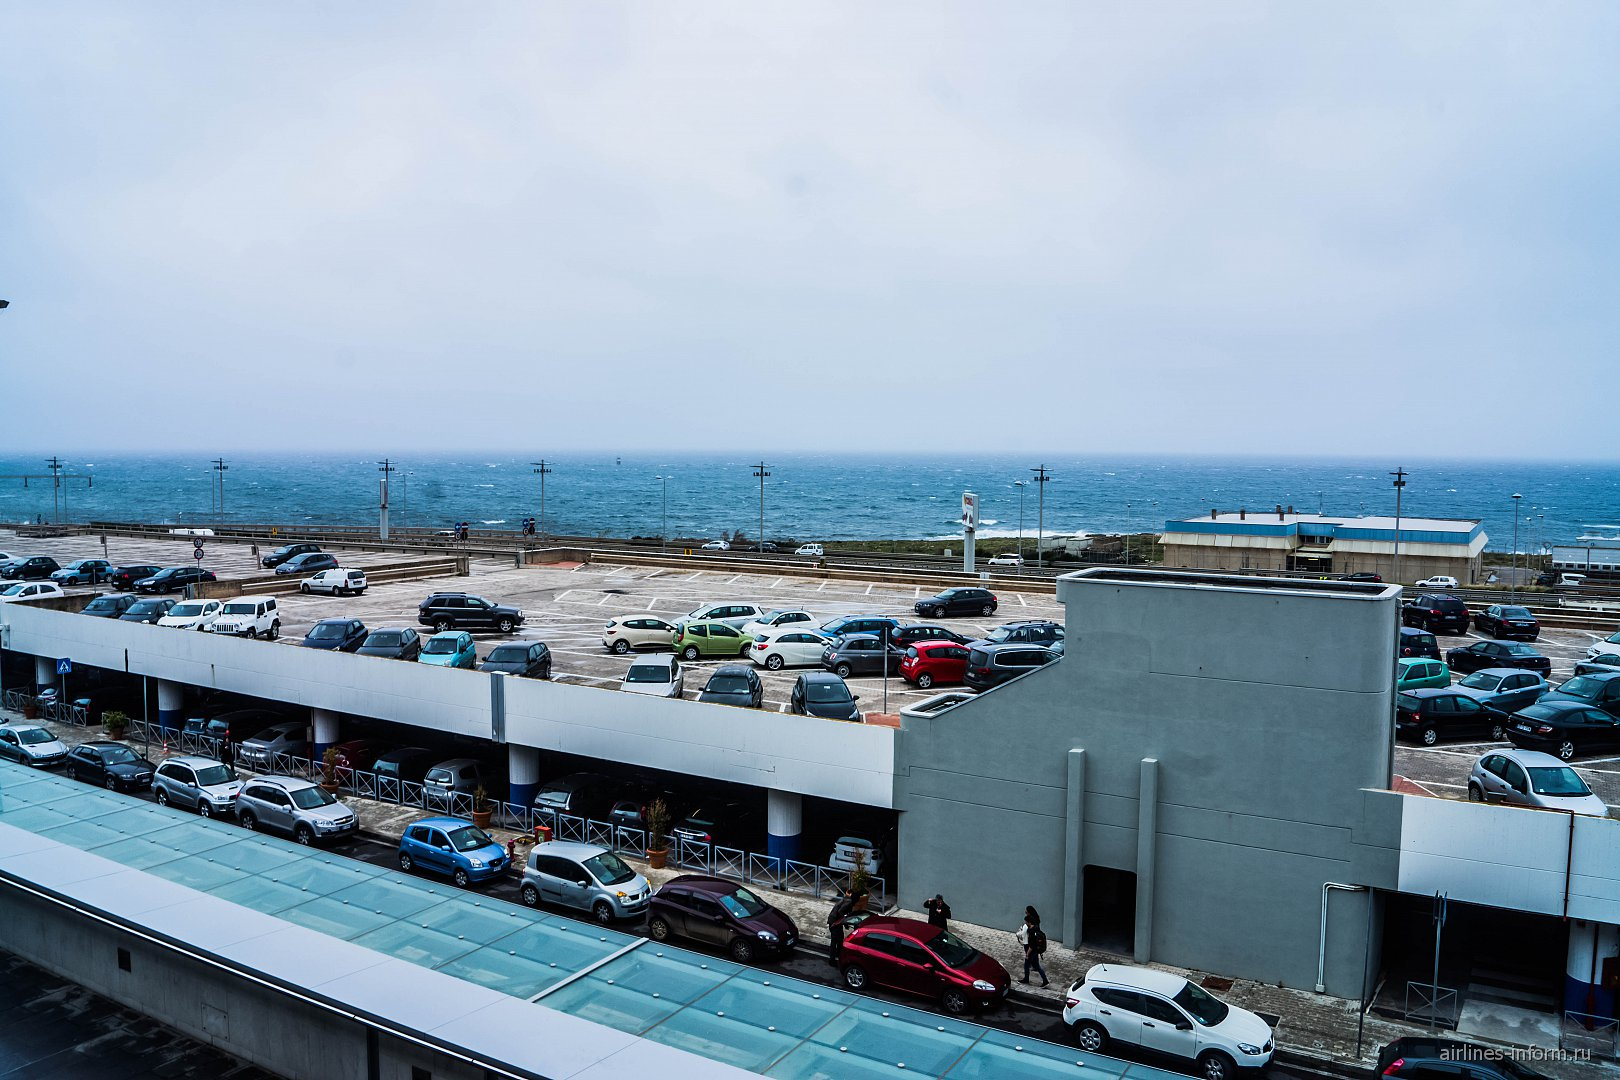 Автомобильный паркинг в аэропорту Палермо